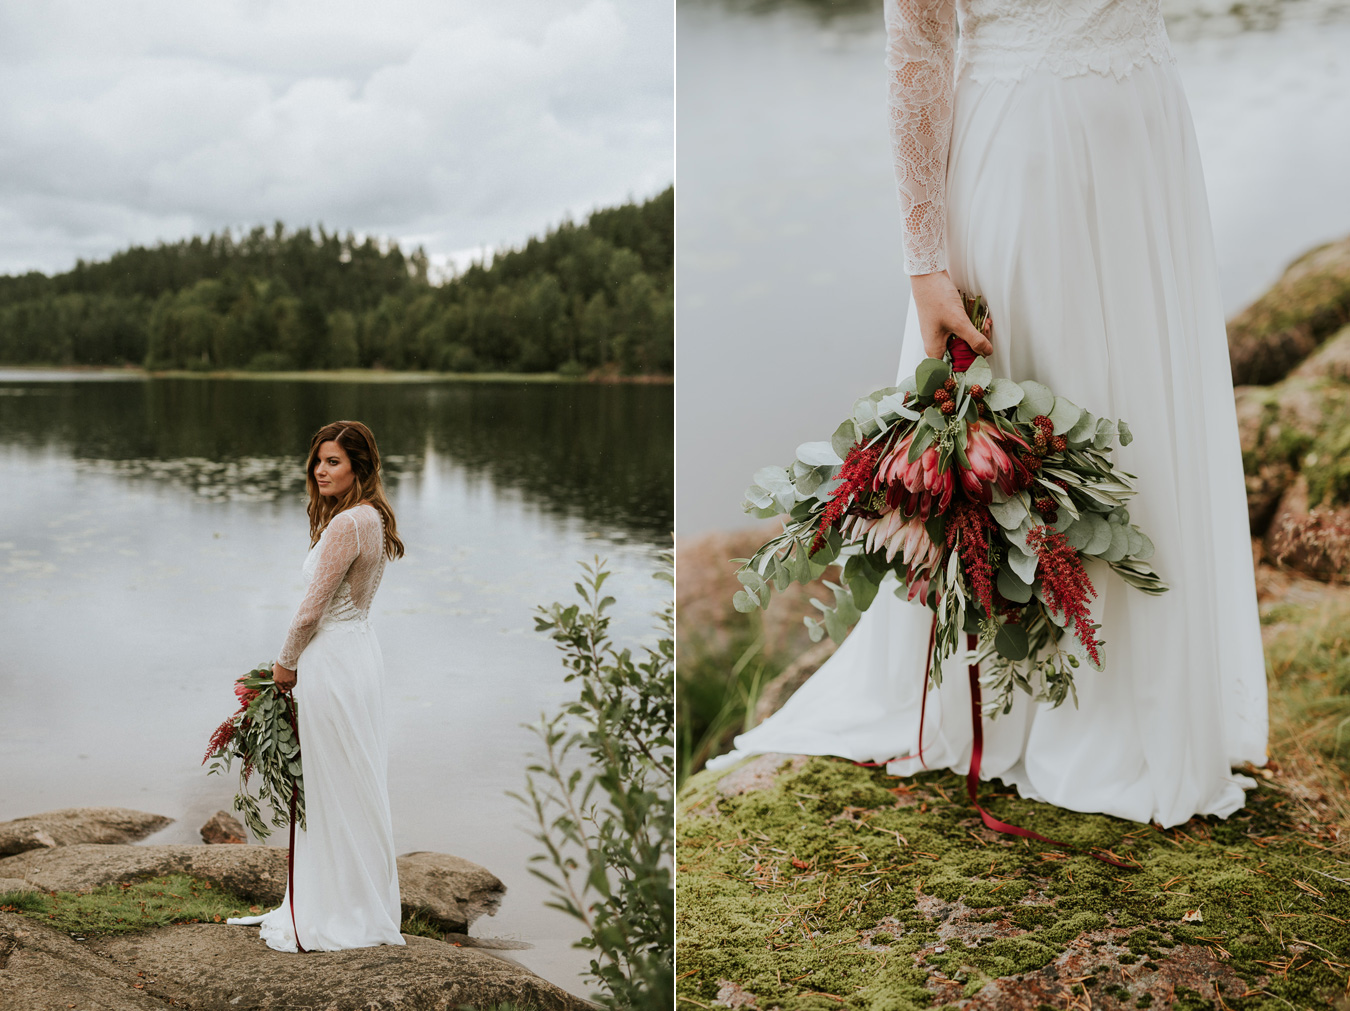 Bryllup-Lageret-Tofte-bryllupsfotograf-136.jpg